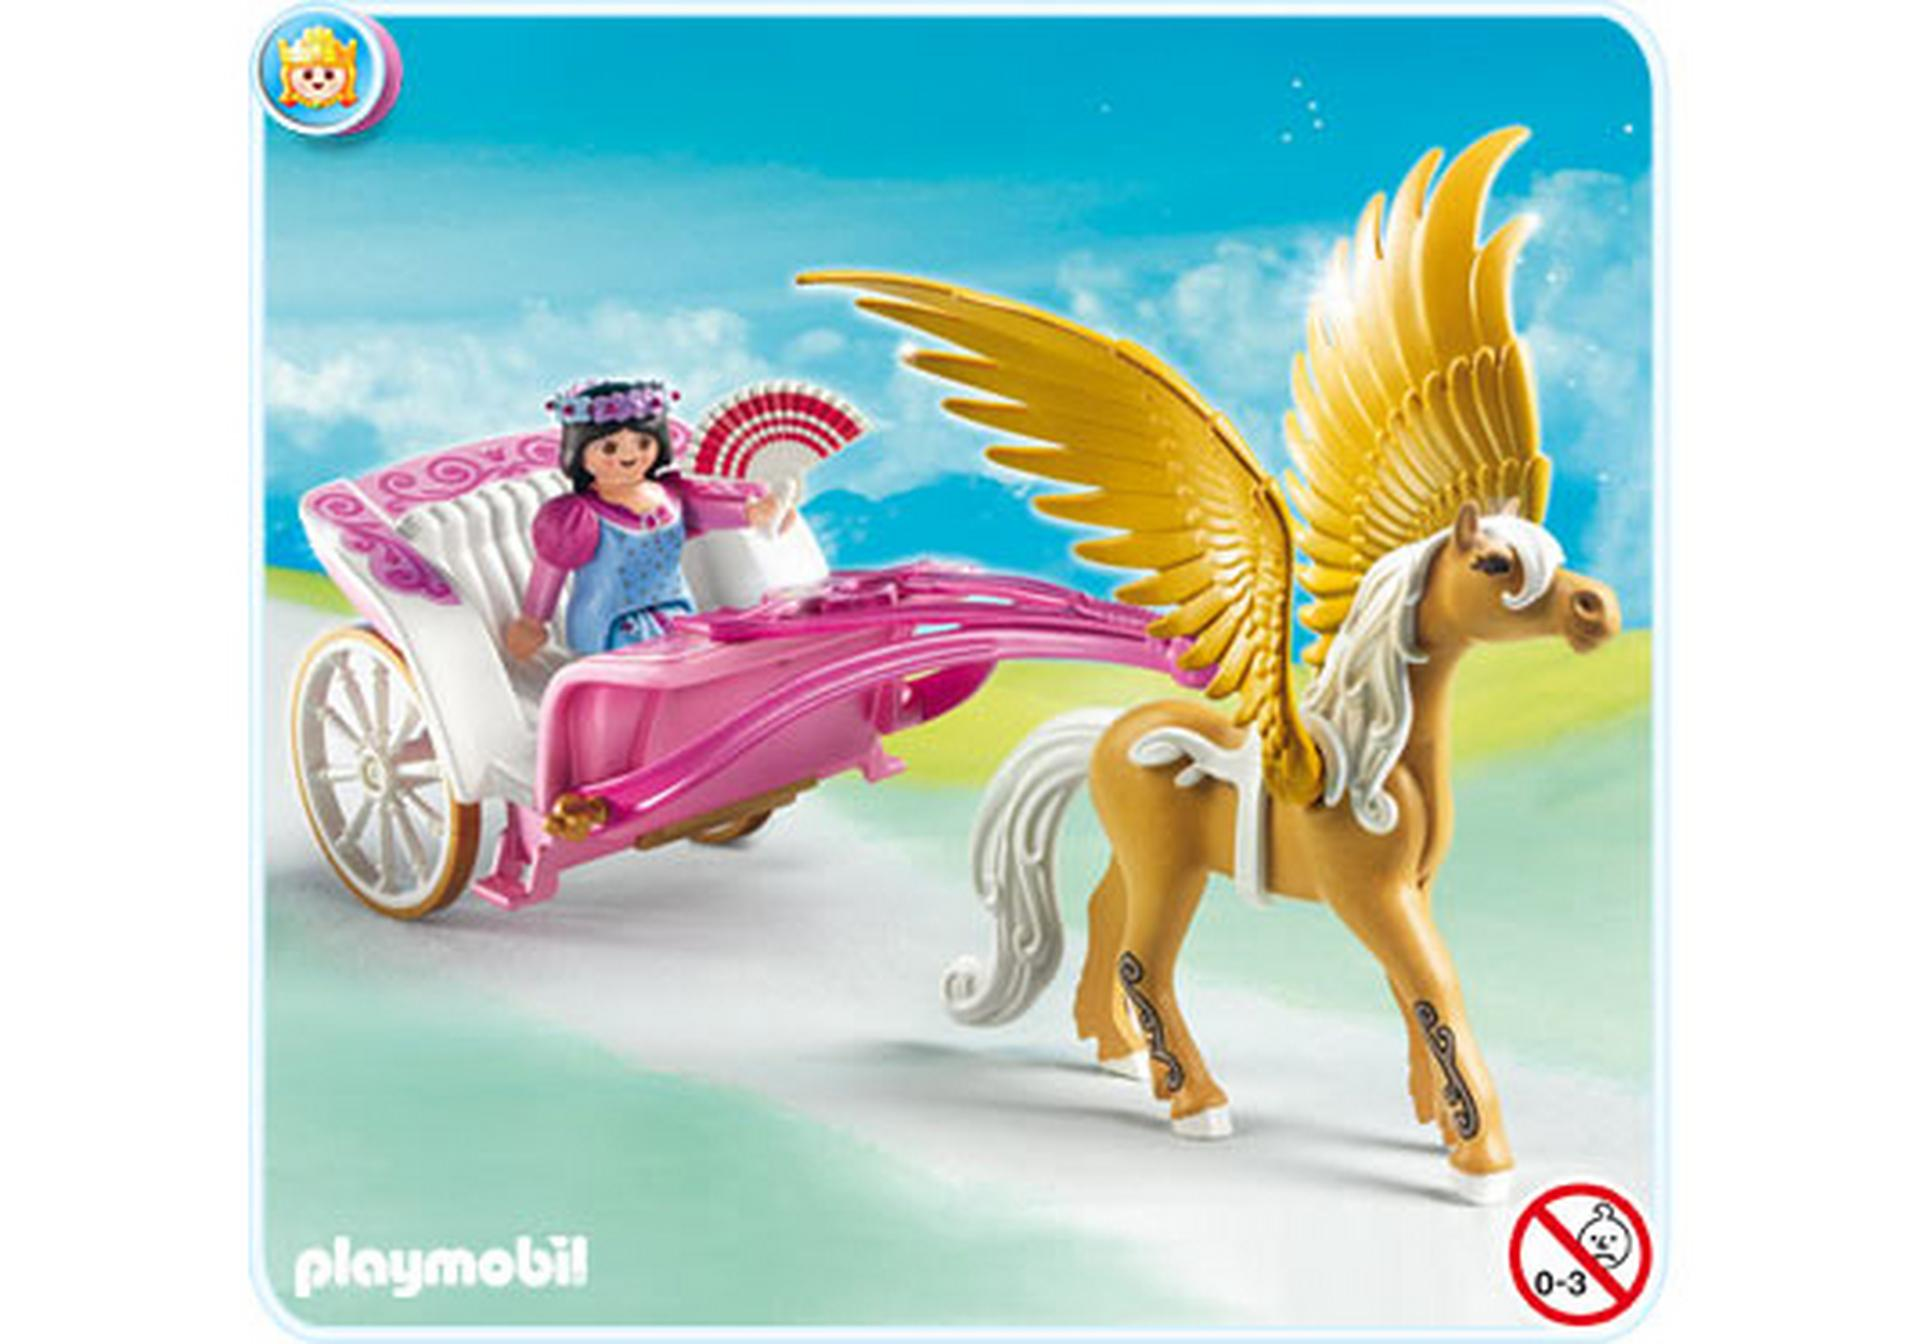 Pegasus kutsche 5143 a playmobil deutschland for Kutsche playmobil